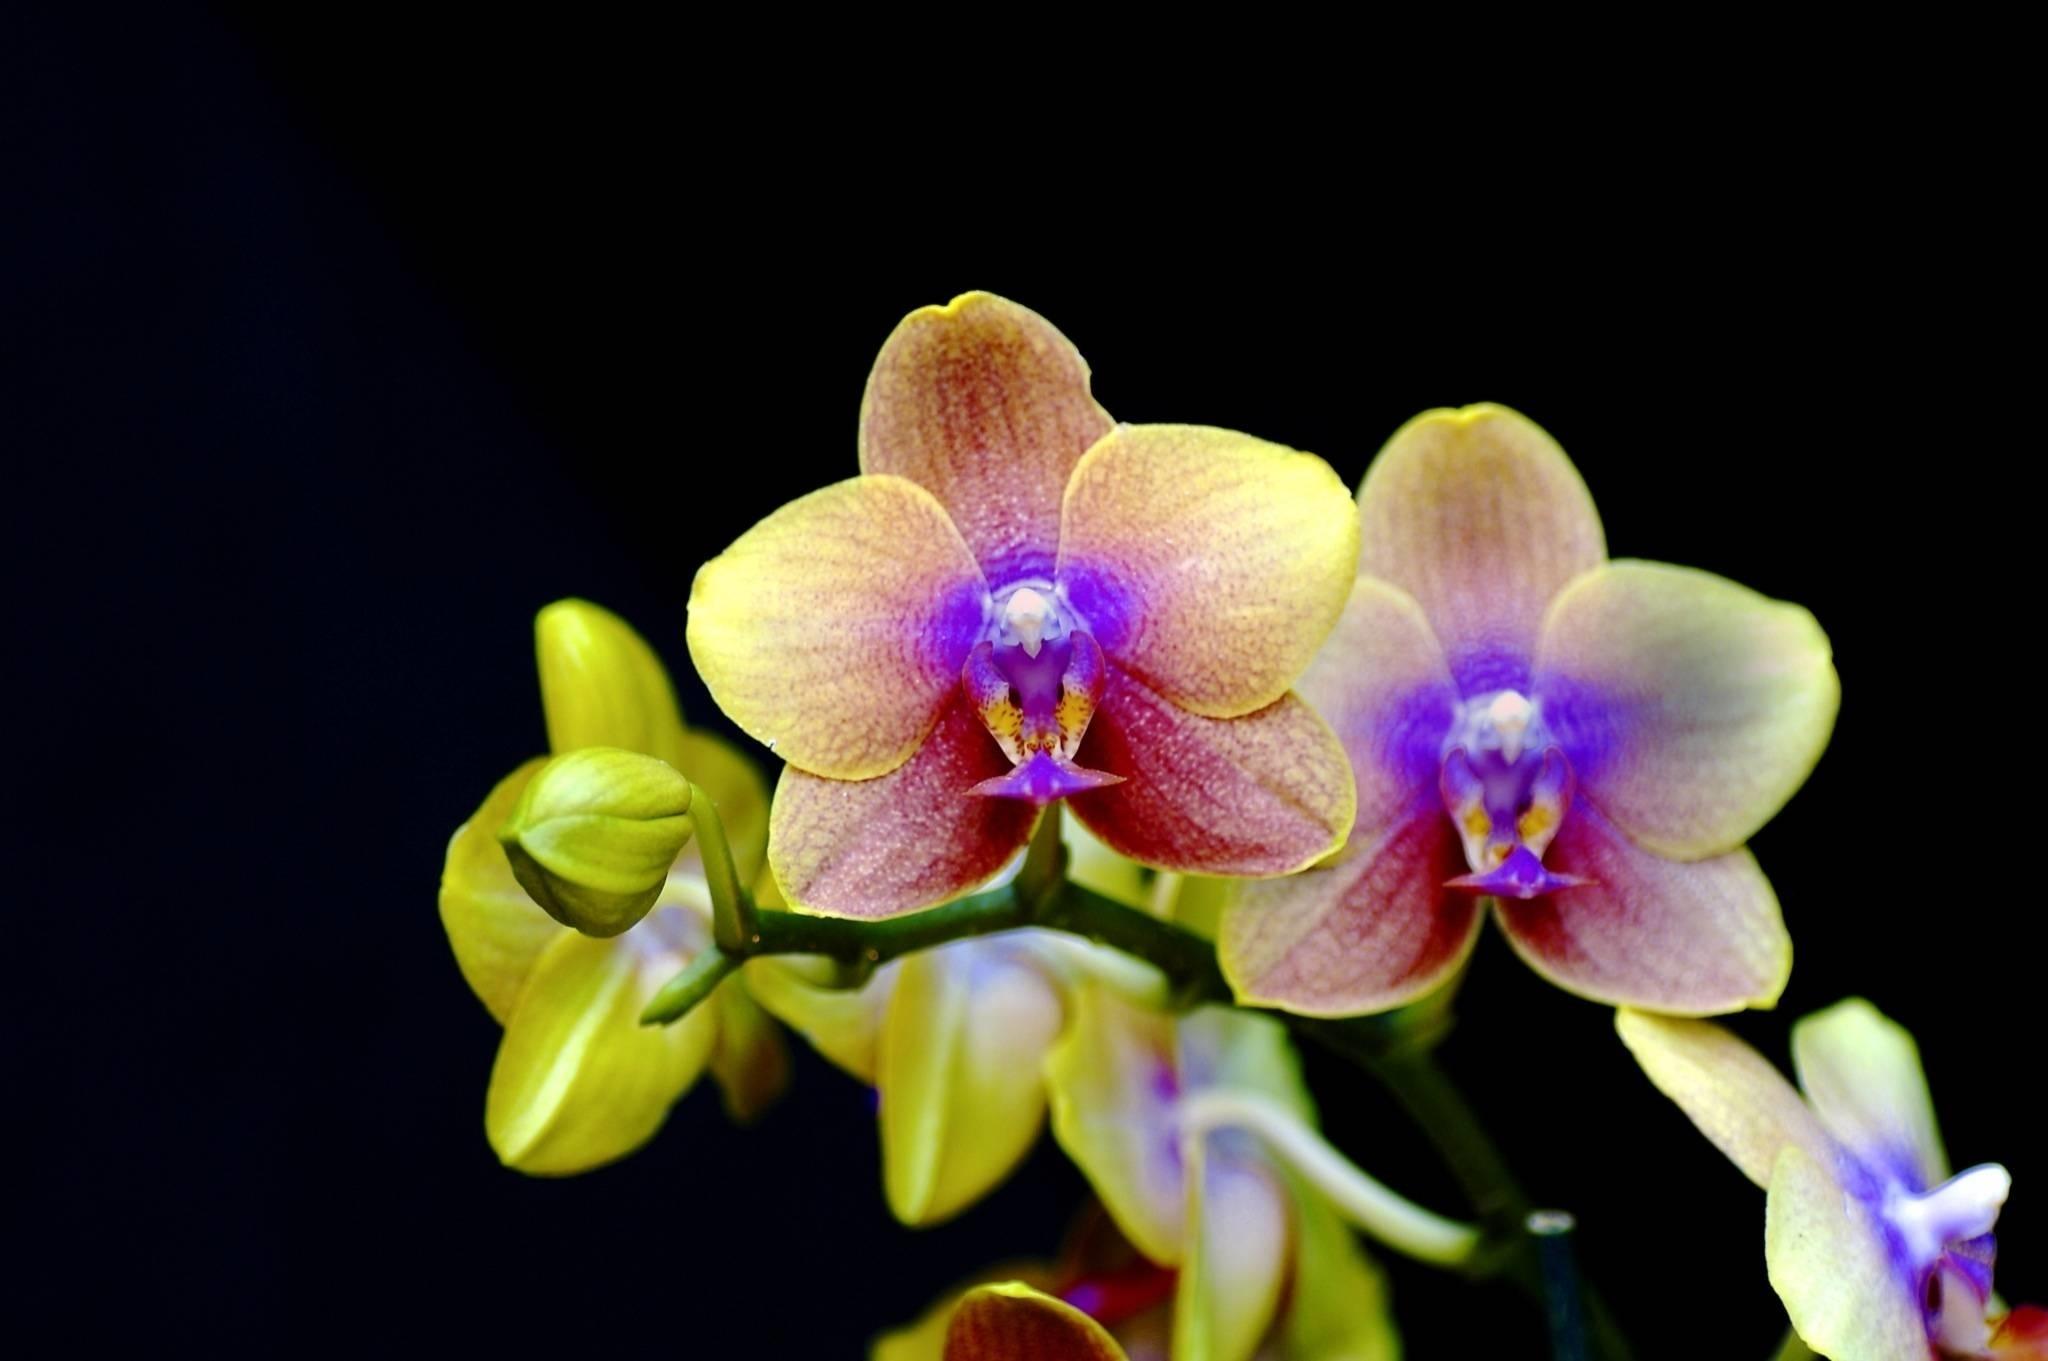 Orchidee in casa - Orchidee